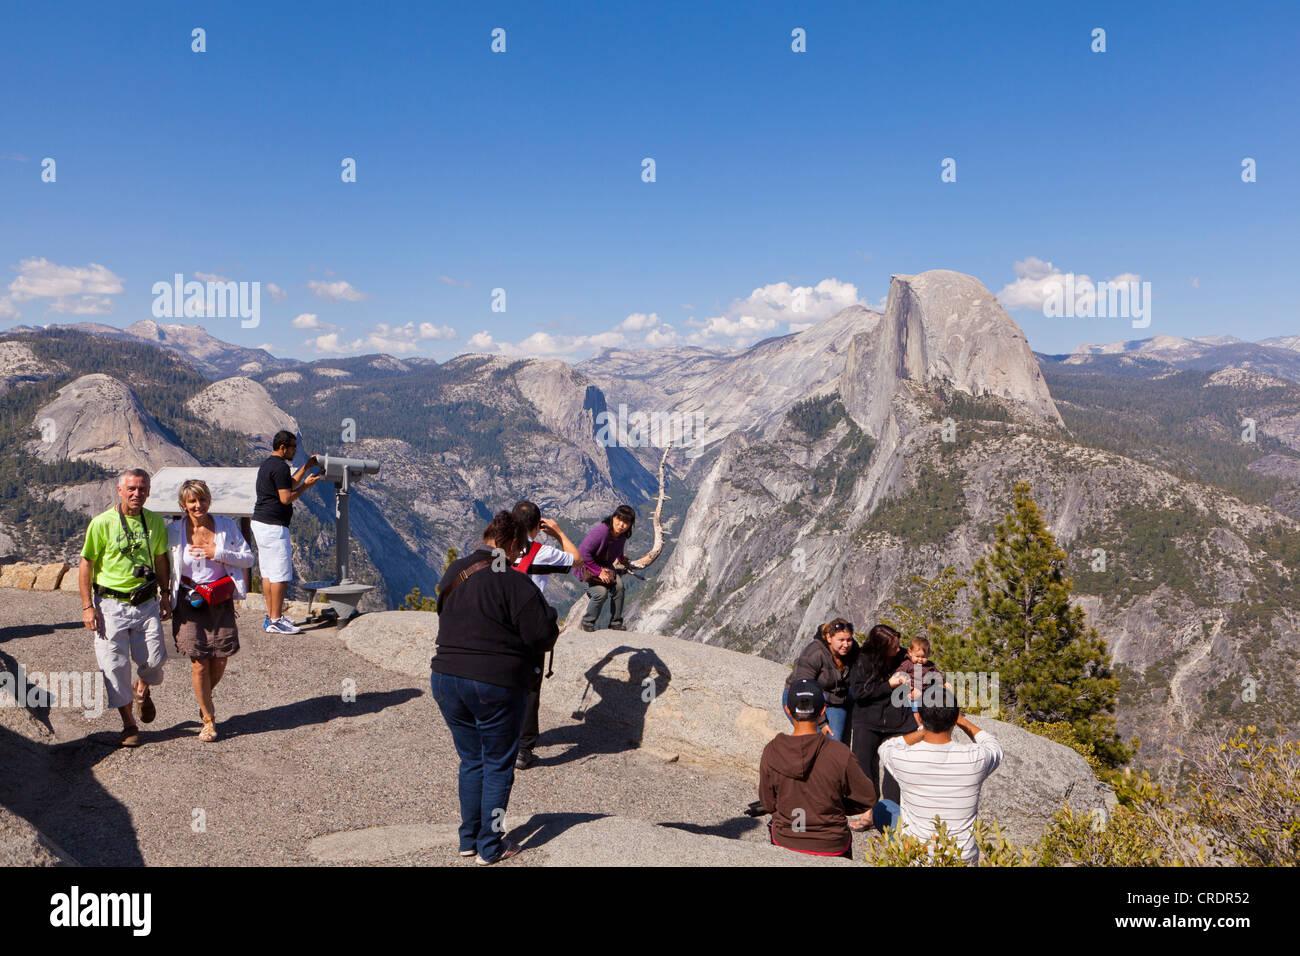 Visitors admiring Half Dome in Yosemite - Stock Image